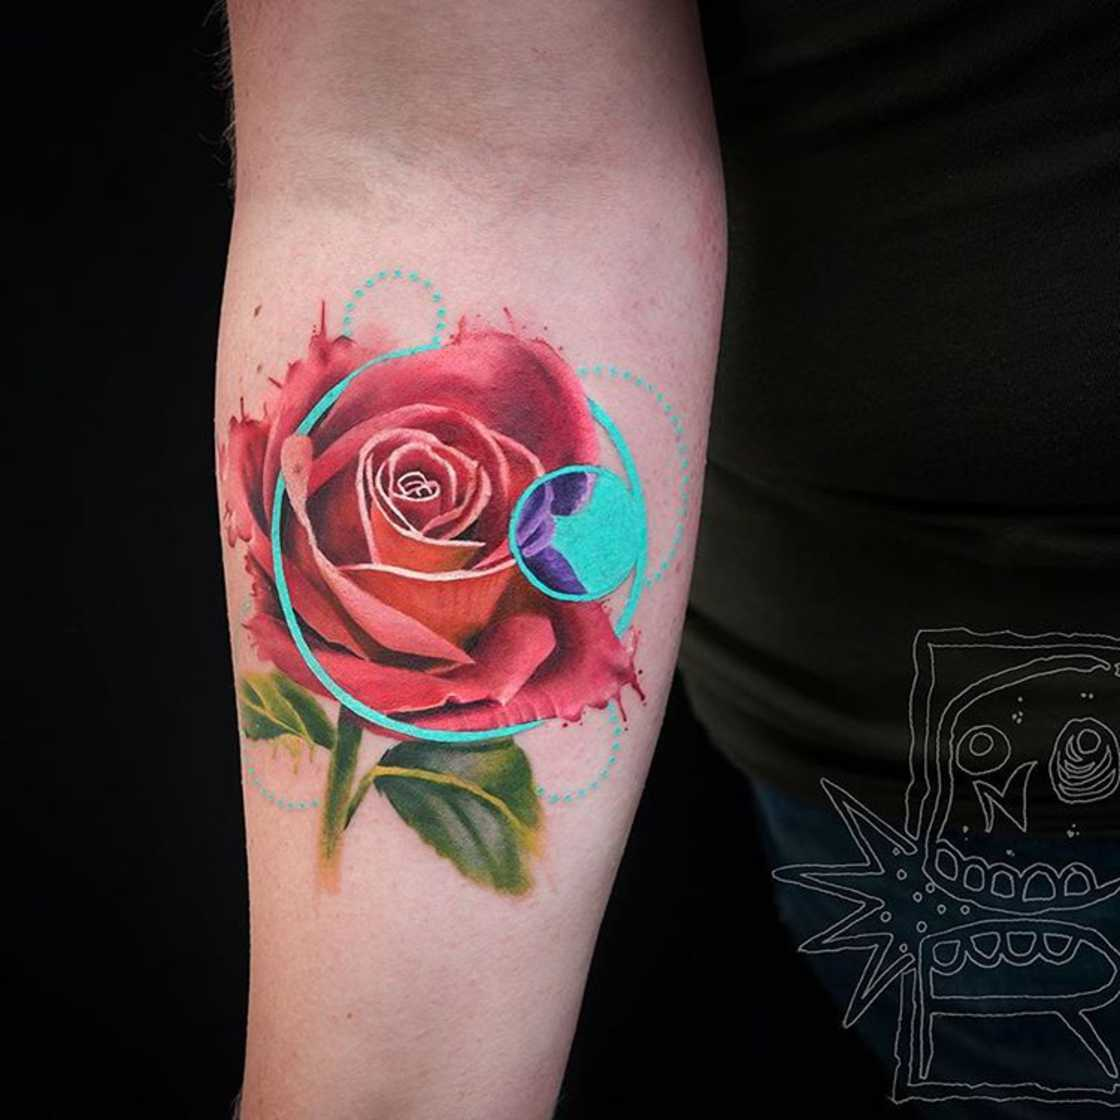 inspiratie tattoo Chris Rigoni tattoos mannen